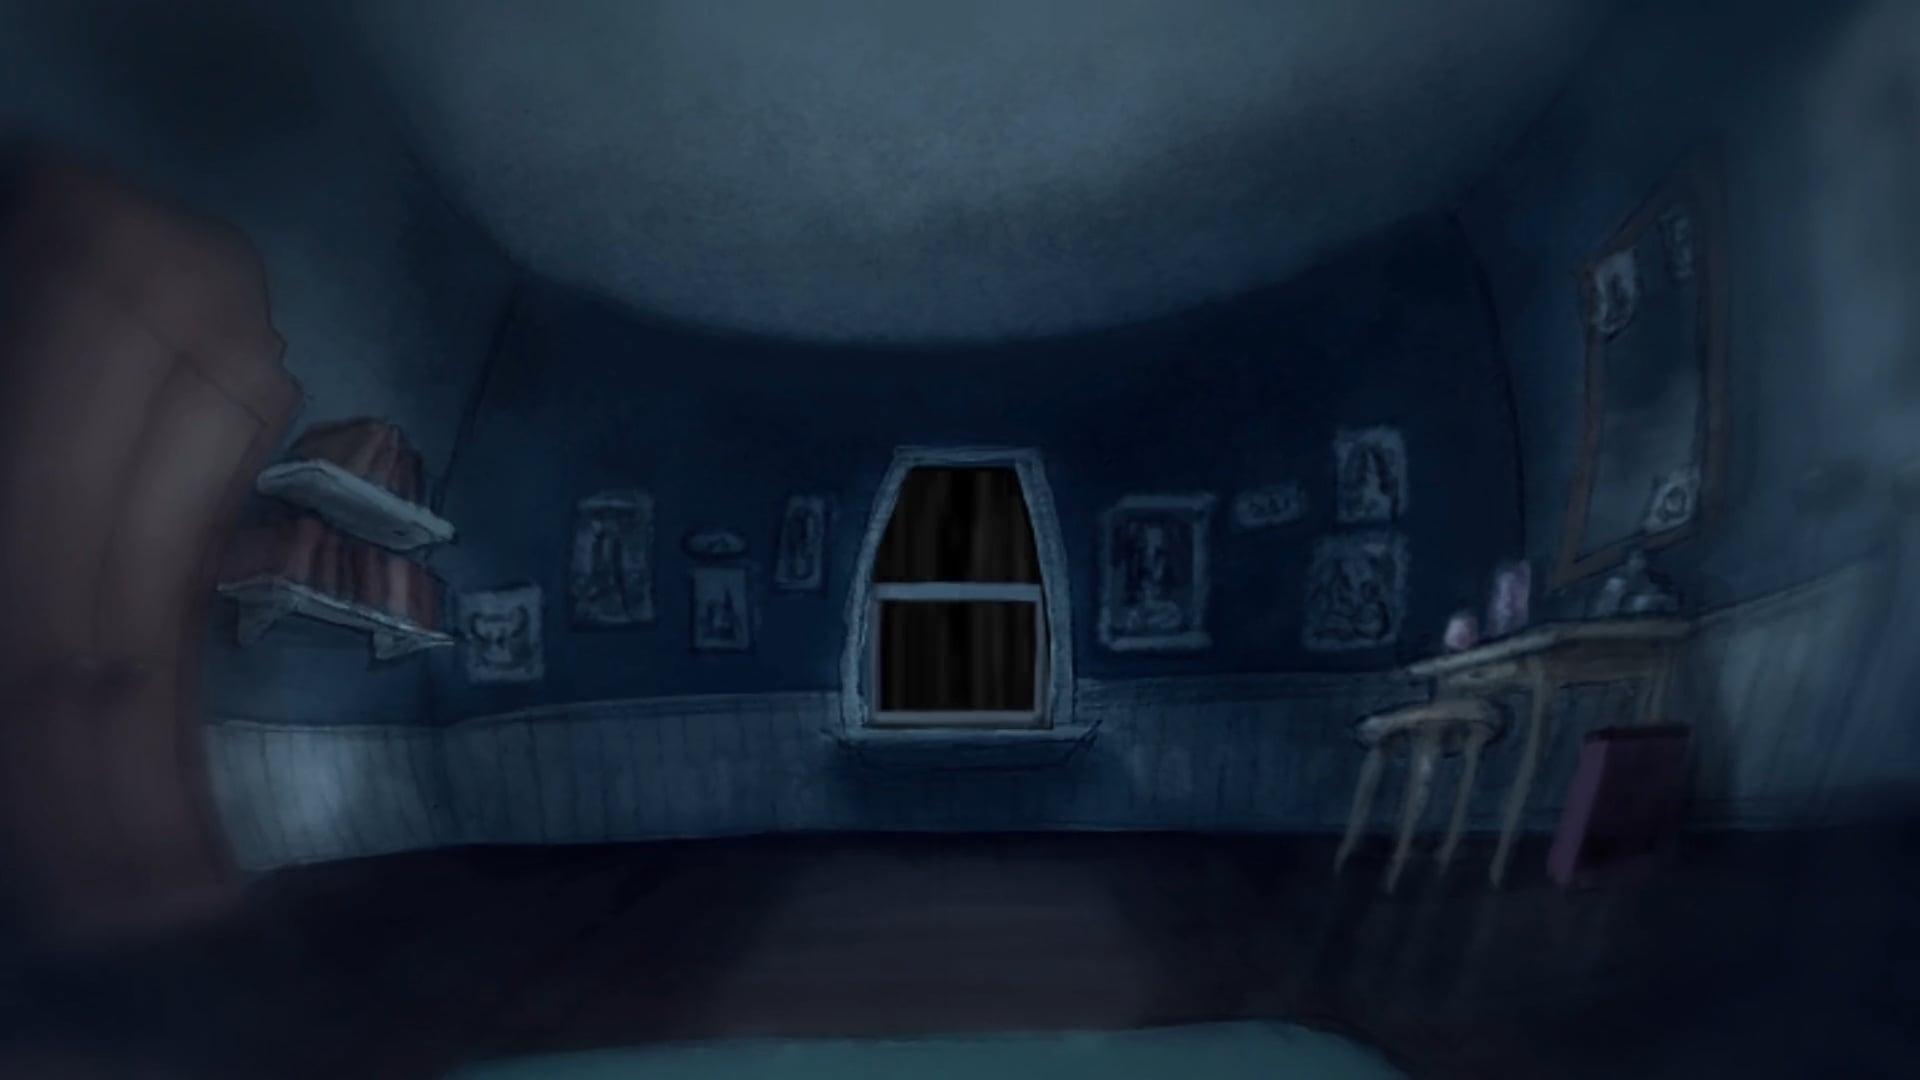 The Animattikon Project / Special Halloween Screening Trailer